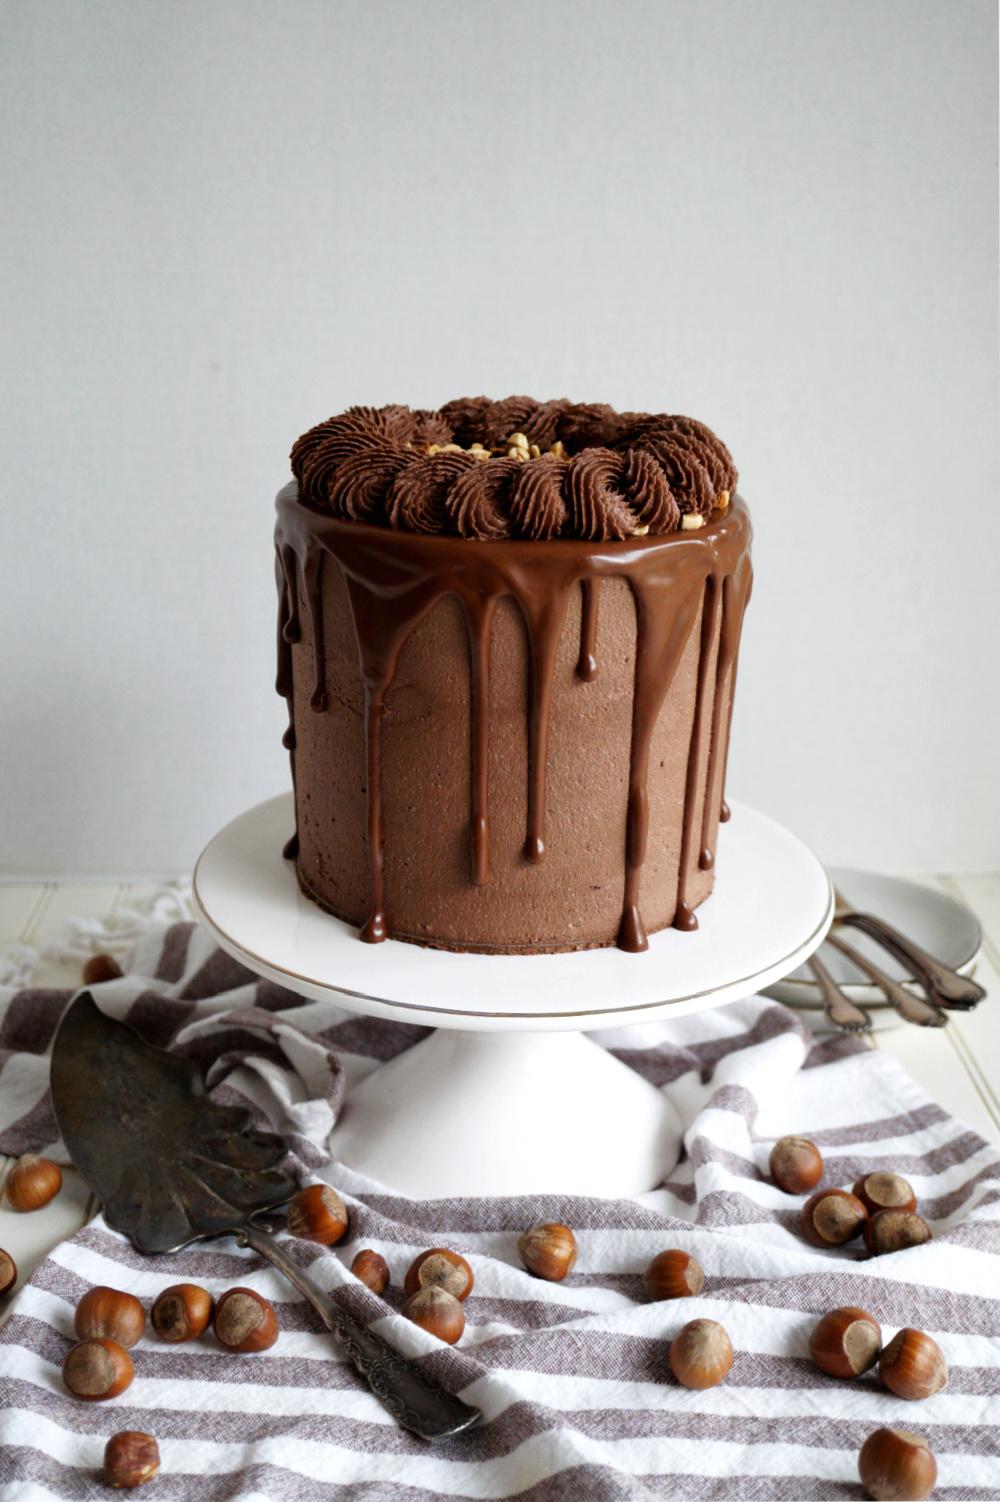 photo of chocolate hazelnut cake on stand